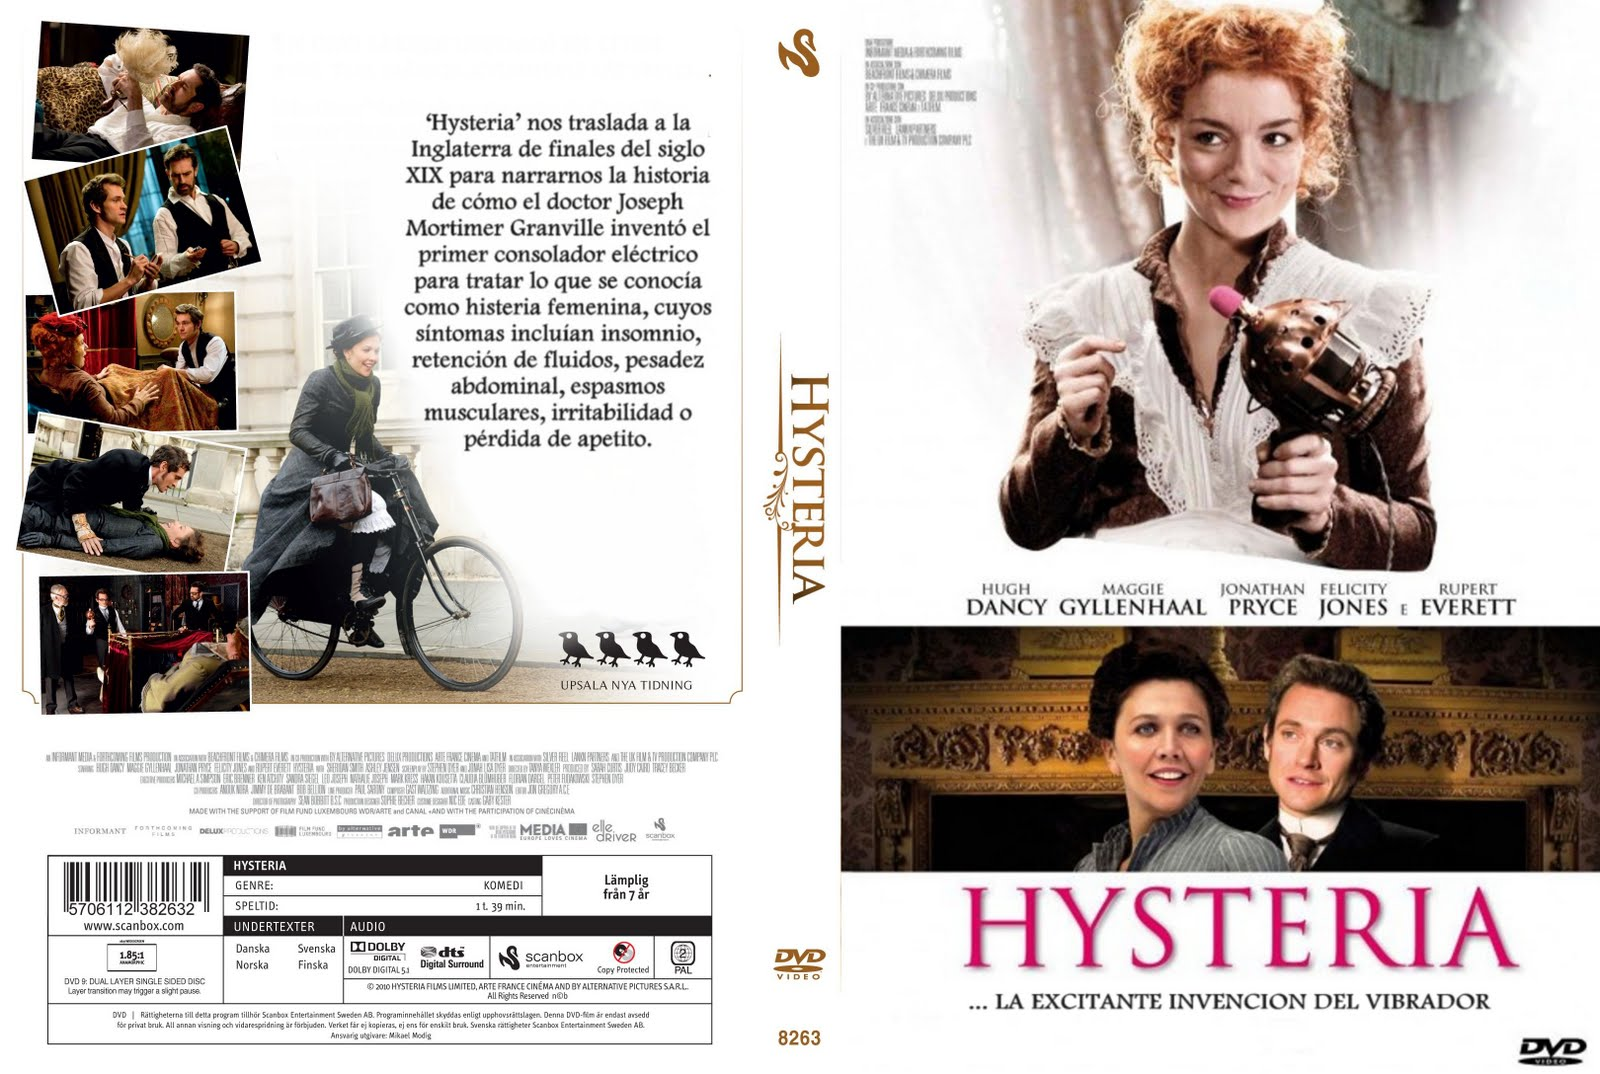 http://1.bp.blogspot.com/-YvwmgGlPGtk/T7egoCHtAdI/AAAAAAAABbc/tKy7K6t9iSQ/s1600/Hysteria+Custom+Por+Locho36+-+dvd.jpg